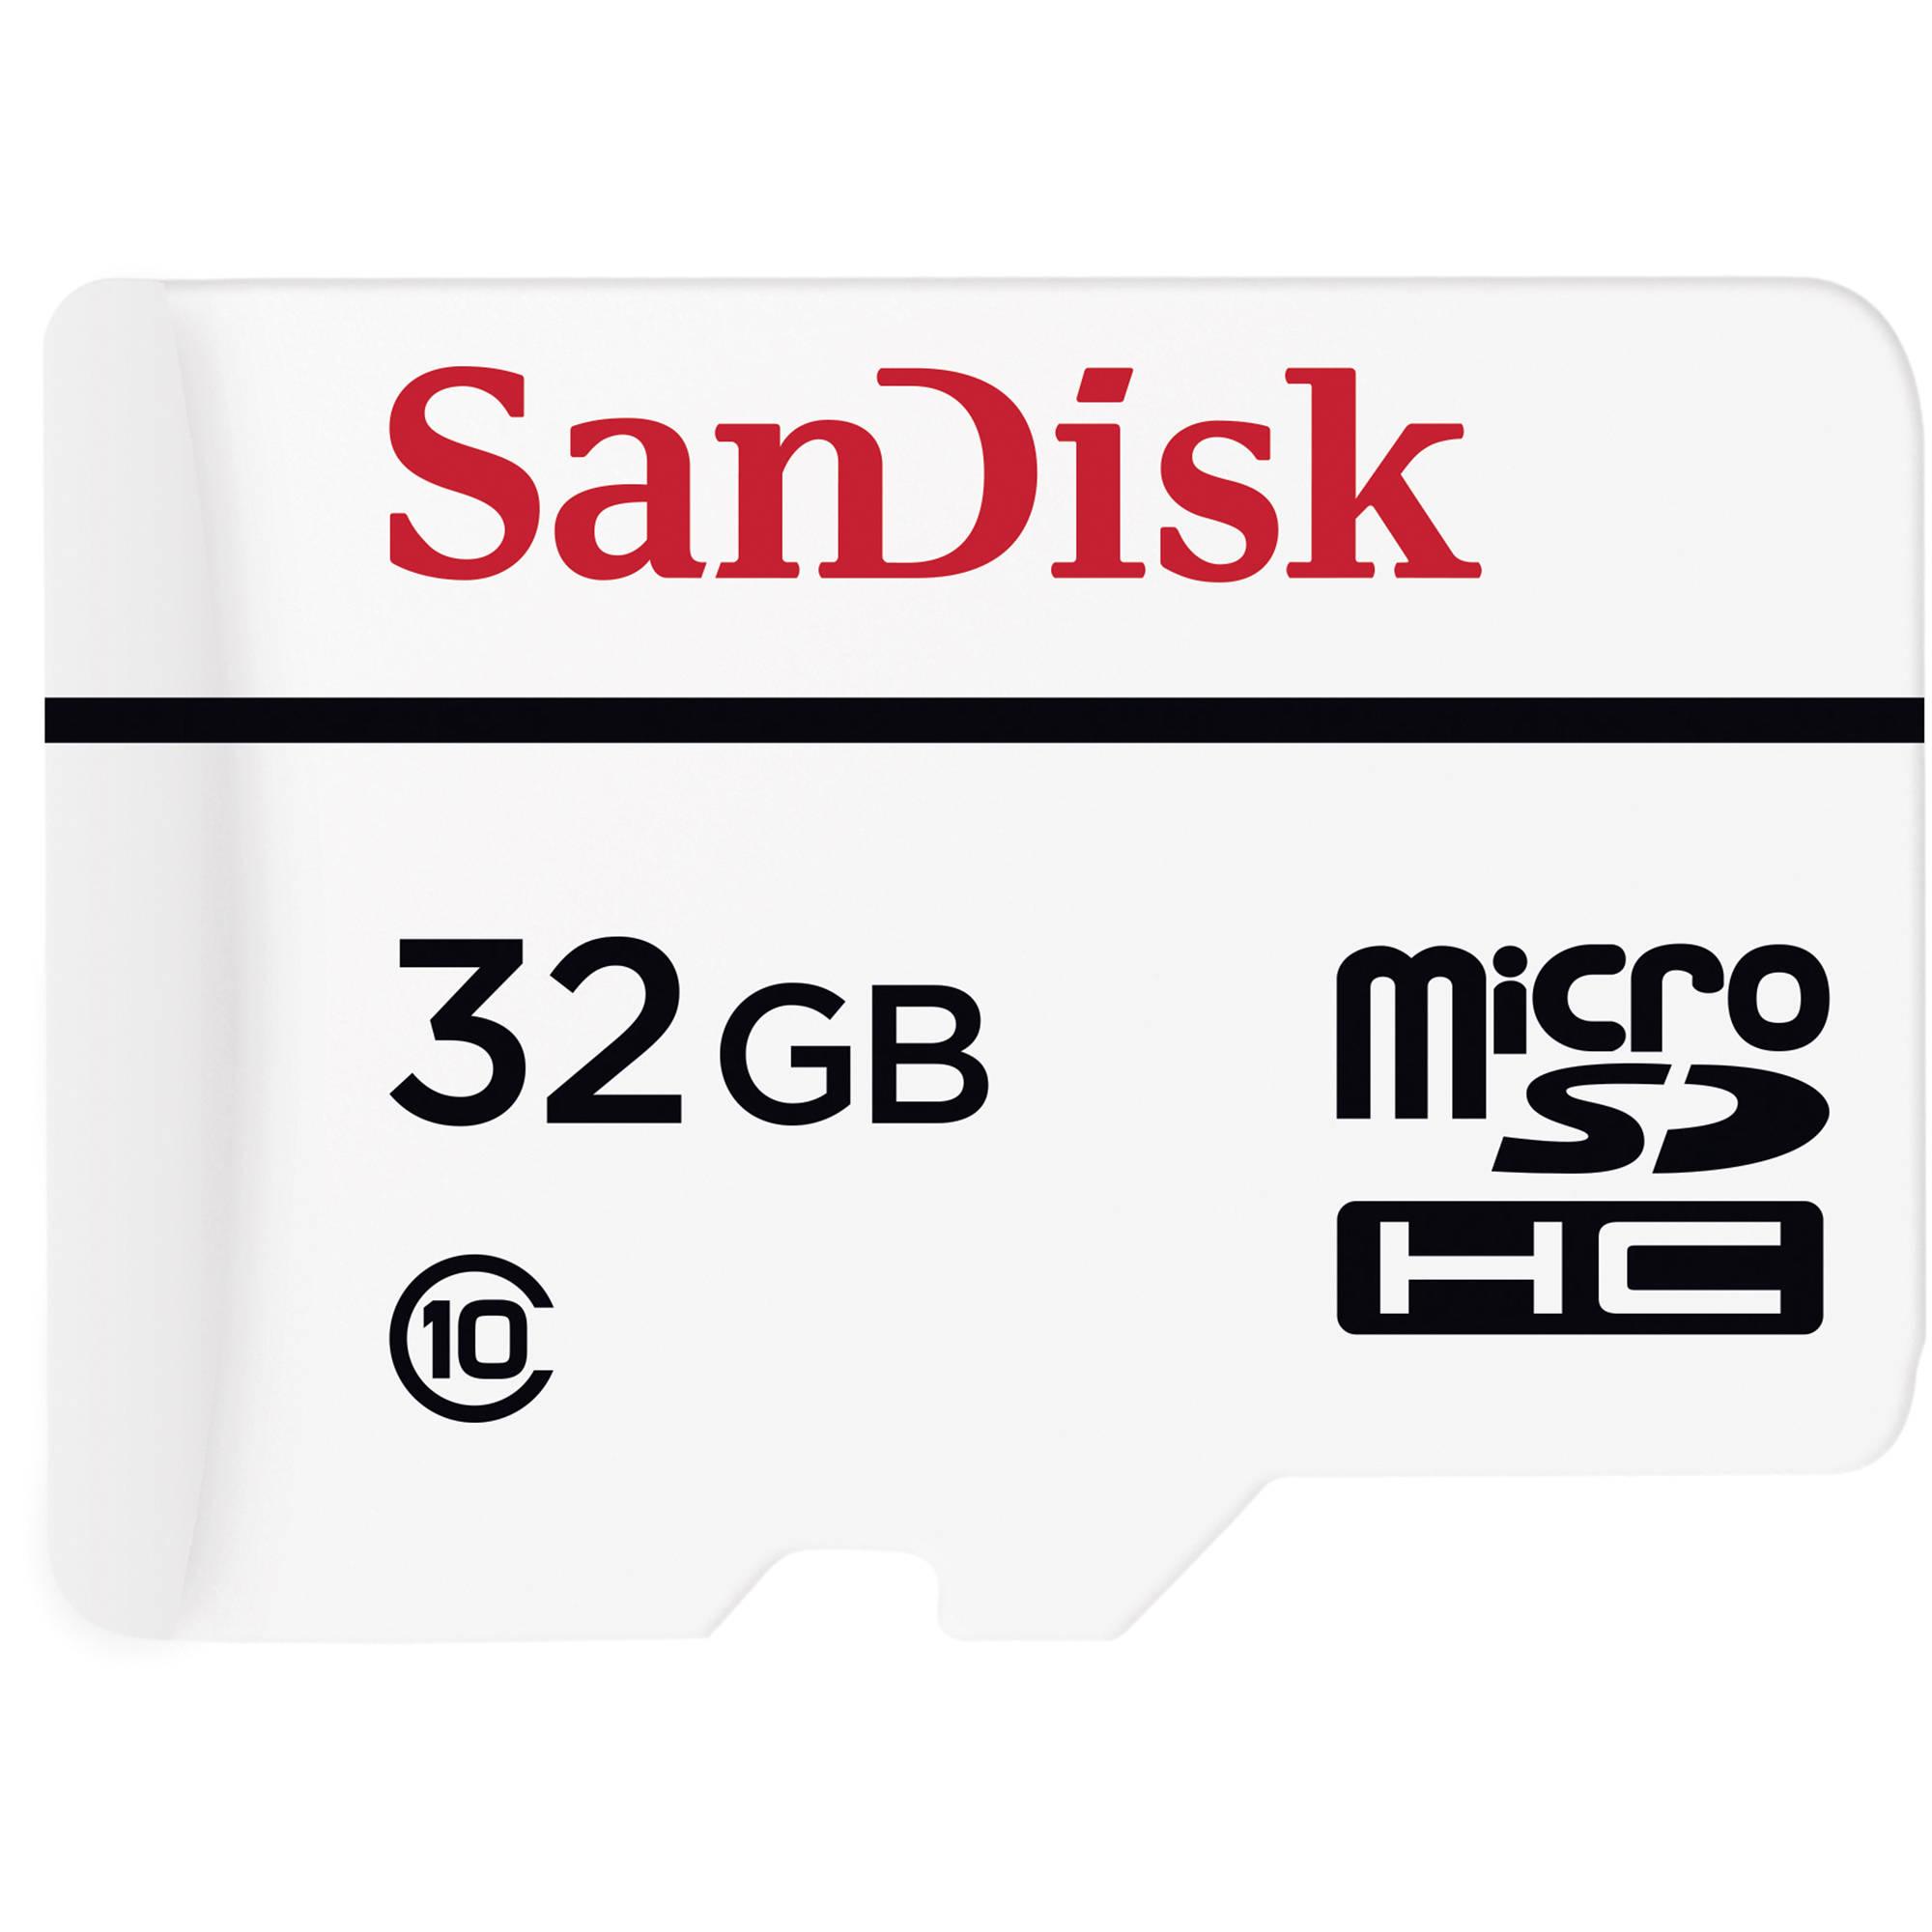 SanDisk High Endurance Video Monitoring microSDHC 32GB £12.86 @ buyur.co.uk